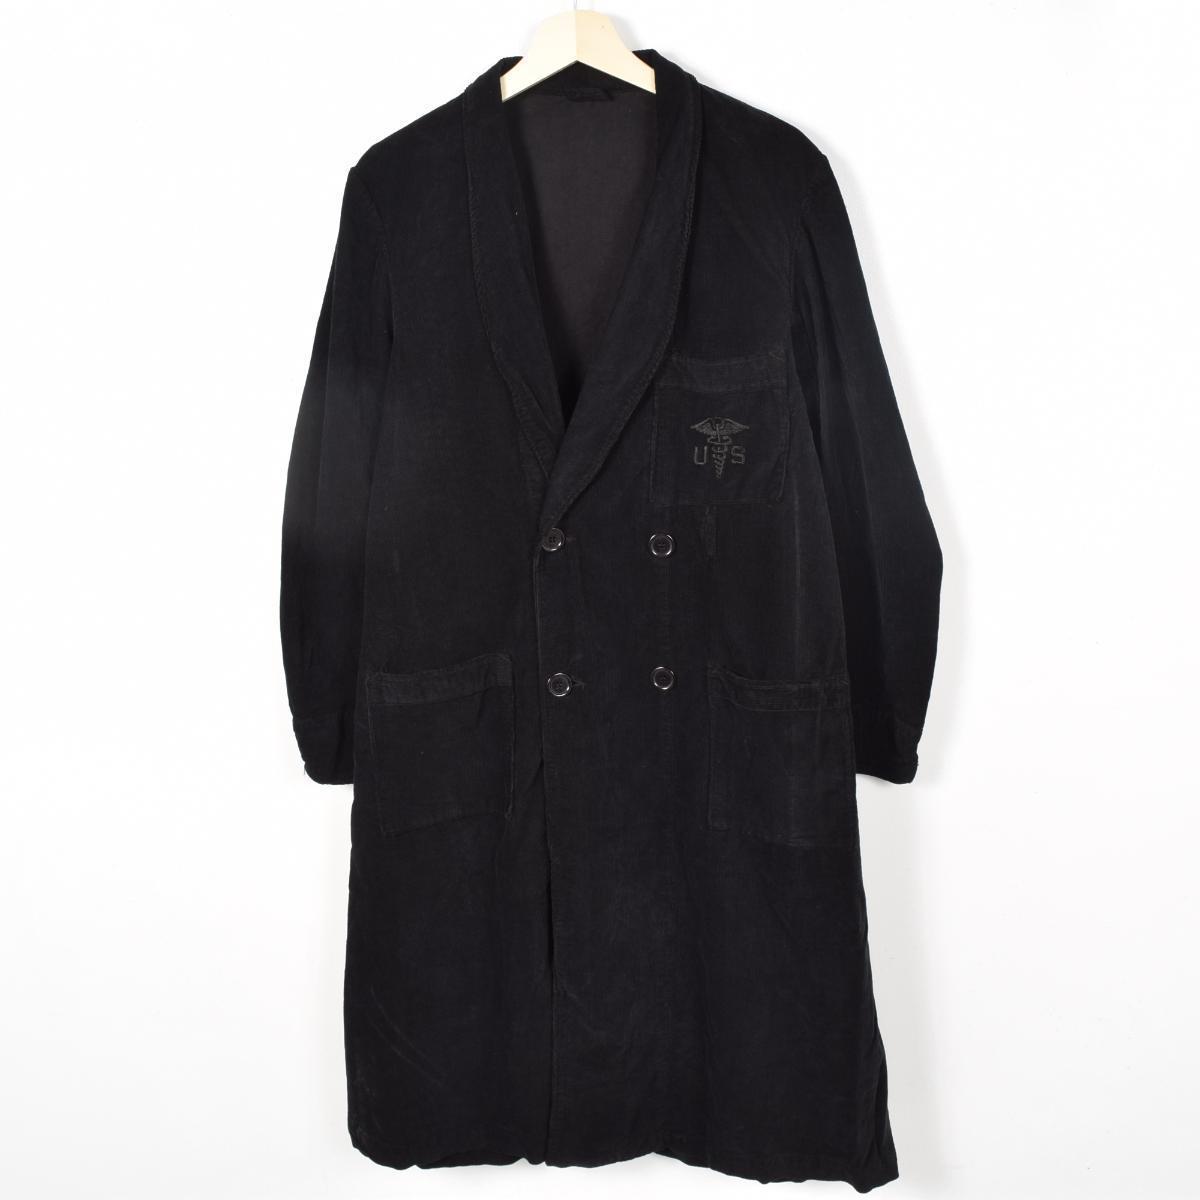 VINTAGE CLOTHING JAM | Rakuten Global Market: U.S. forces true ...